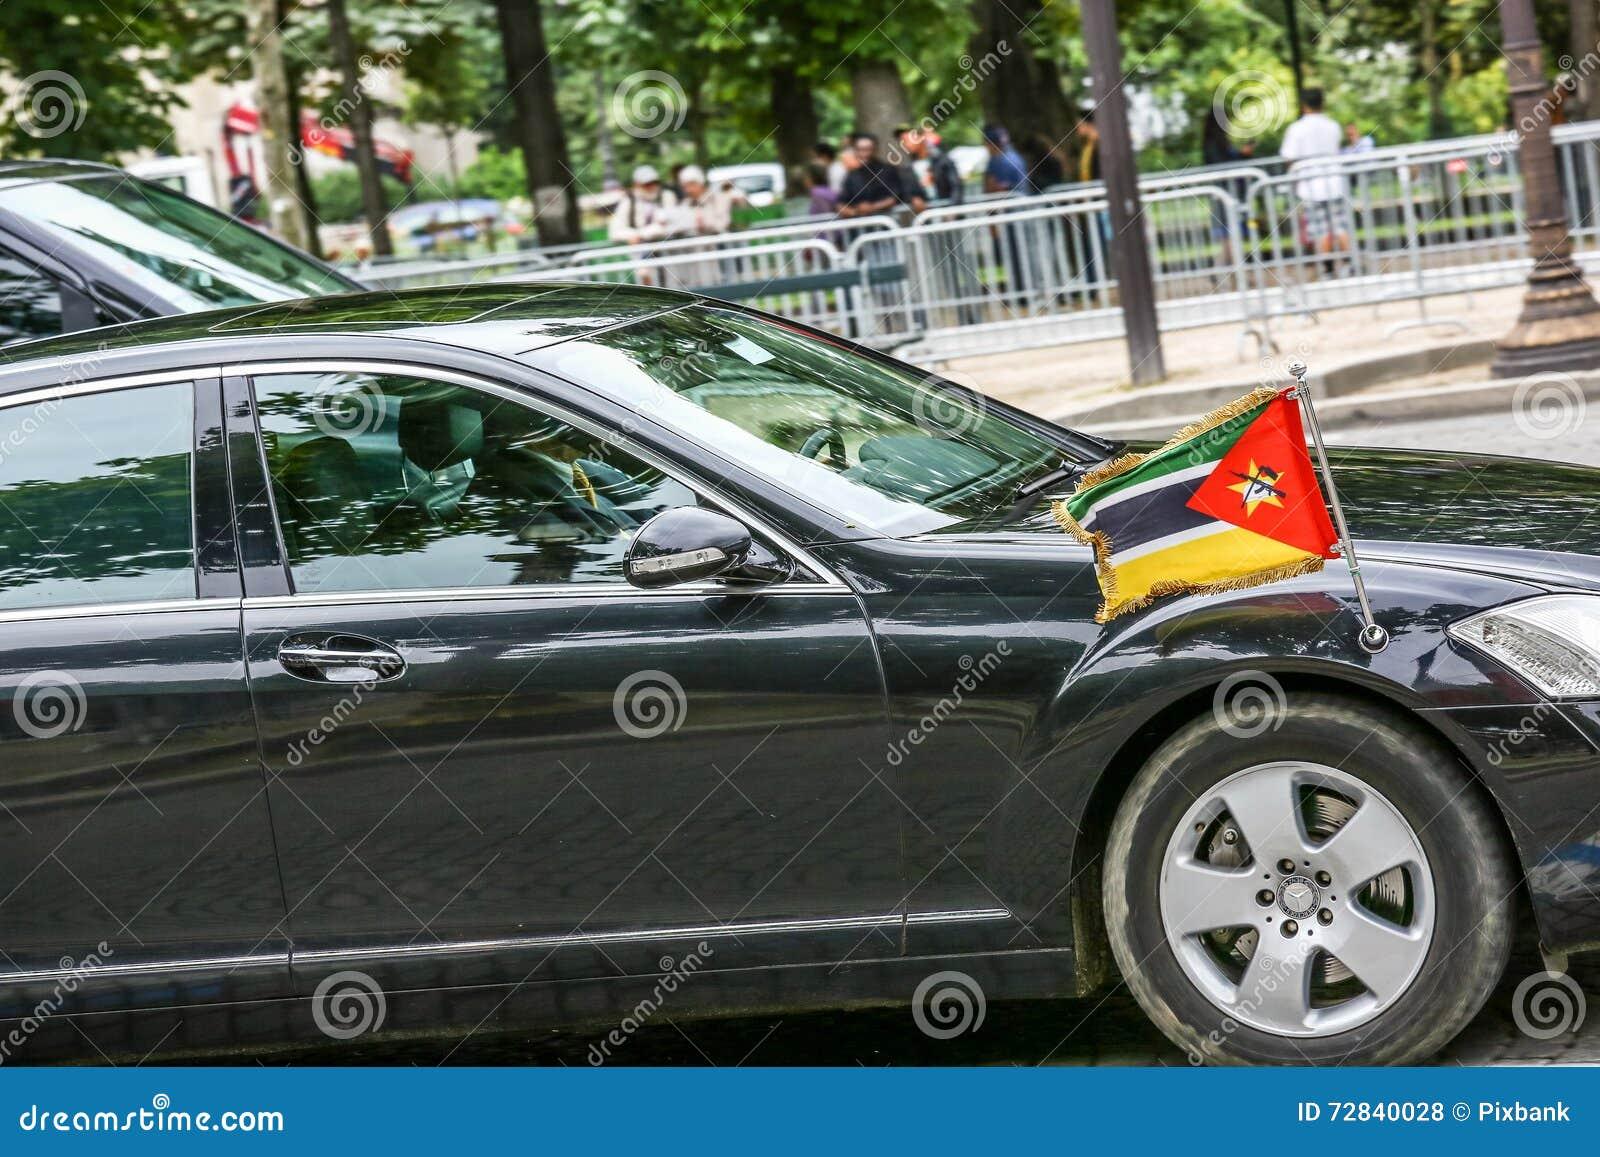 Carro diplomático de Moçambique durante a parada militar ( Defile) no dia ( da república; Bastille Day) EL dos campeões